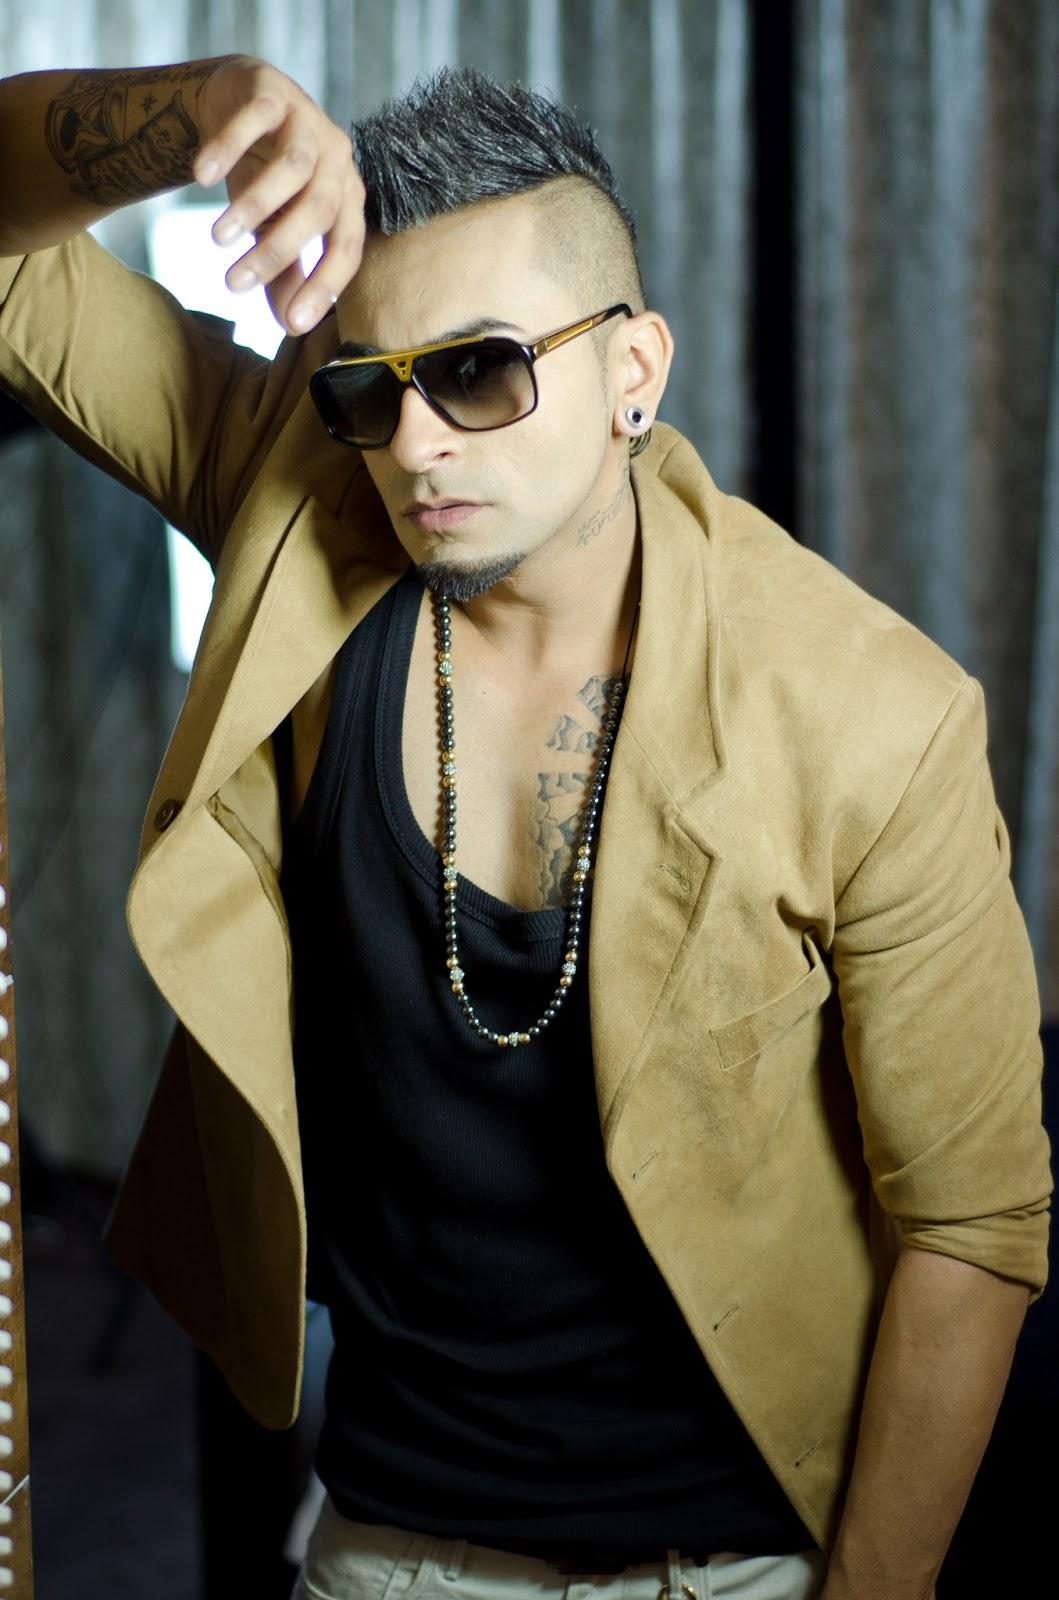 Punjabi Singer Hairstyle Punjabi Singer Hairstyle